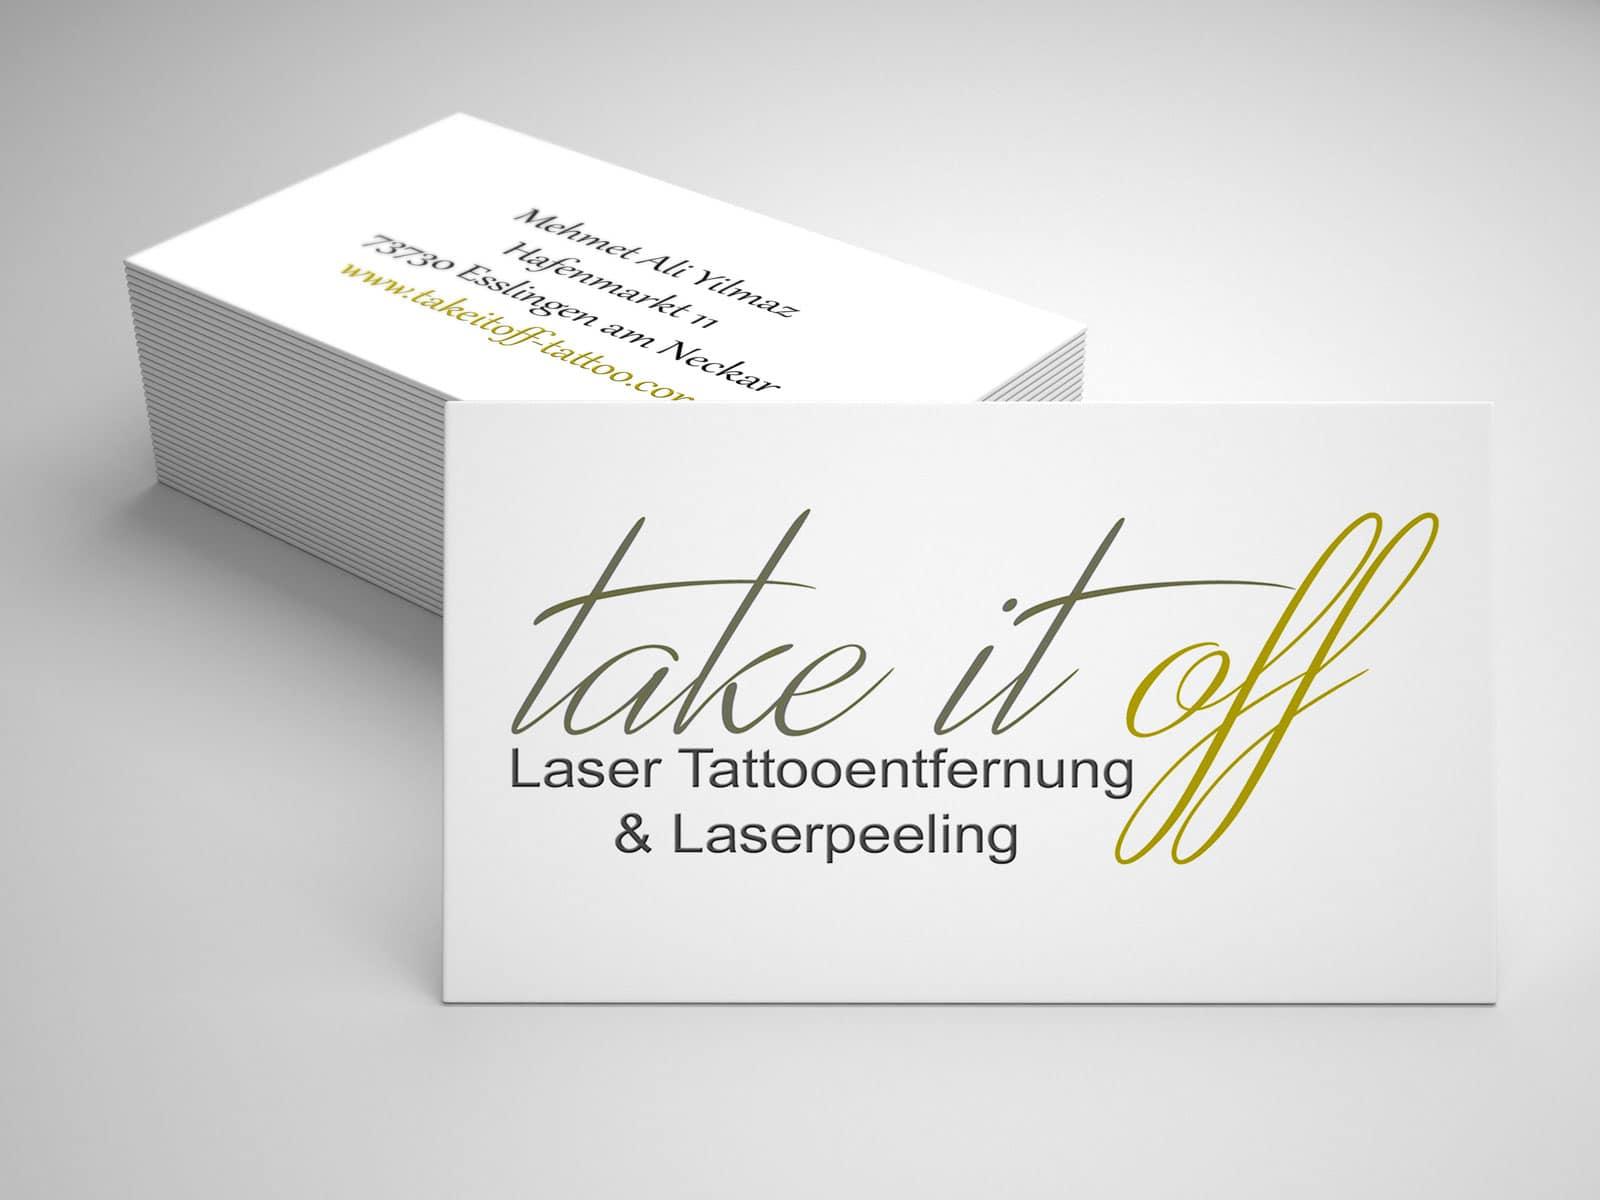 liebespixel-kirchheim-print-logo-visitenkarte-take-it-off